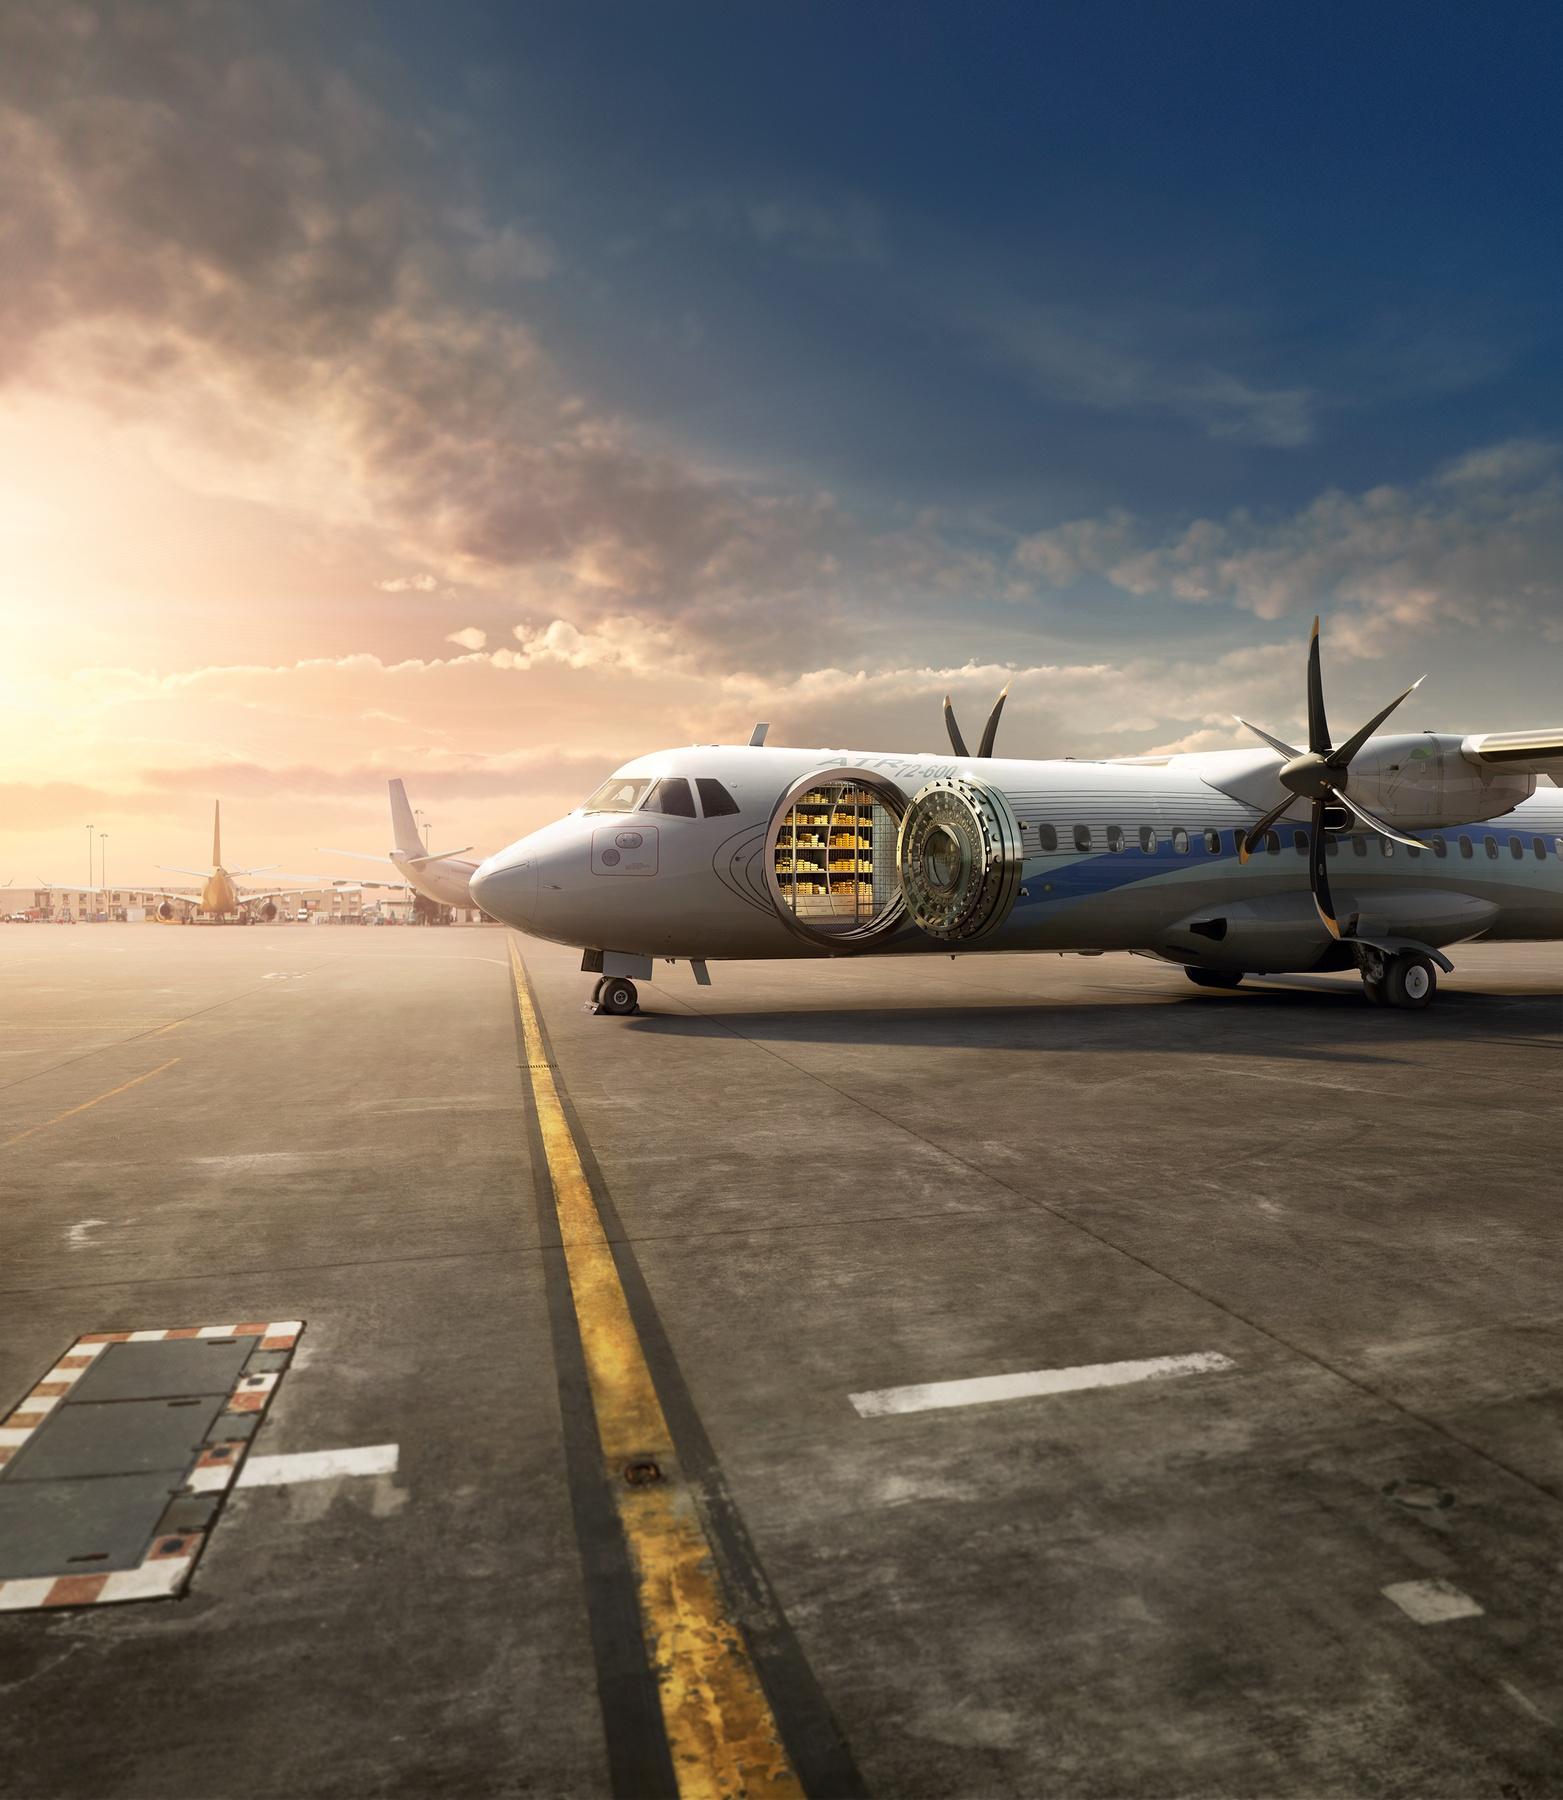 CGI'd photo of airplane